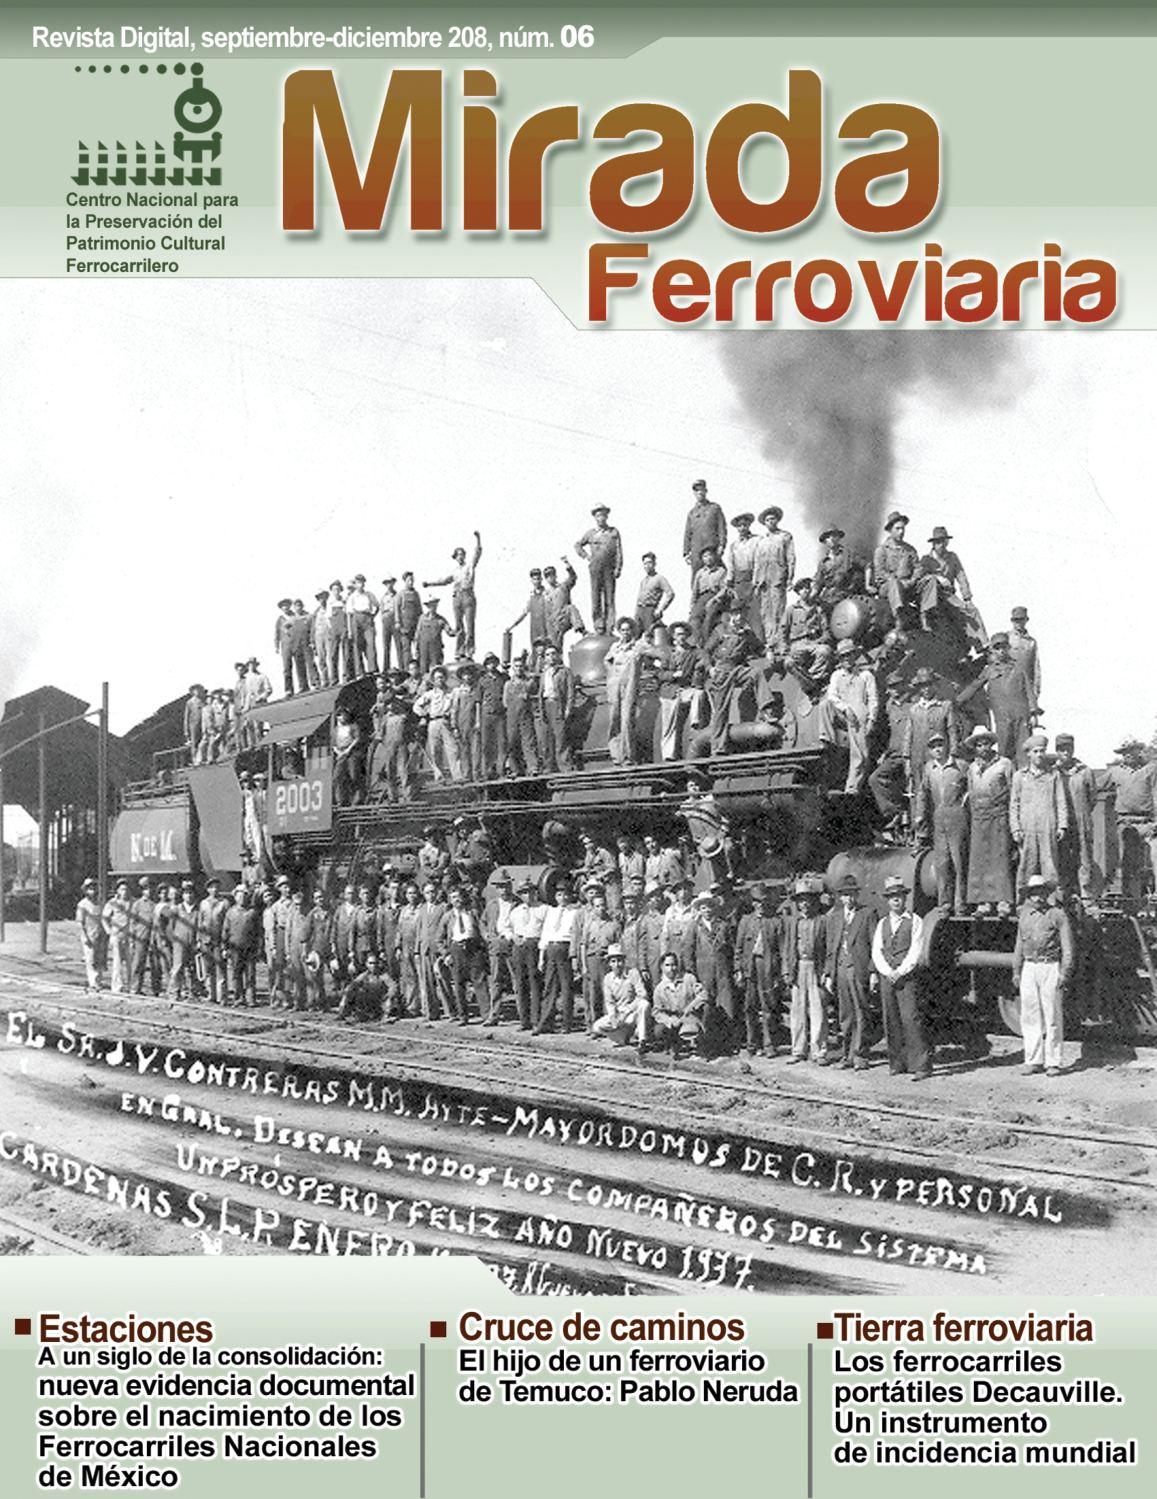 Calaméo - Mirada Ferroviaria 6 Digital